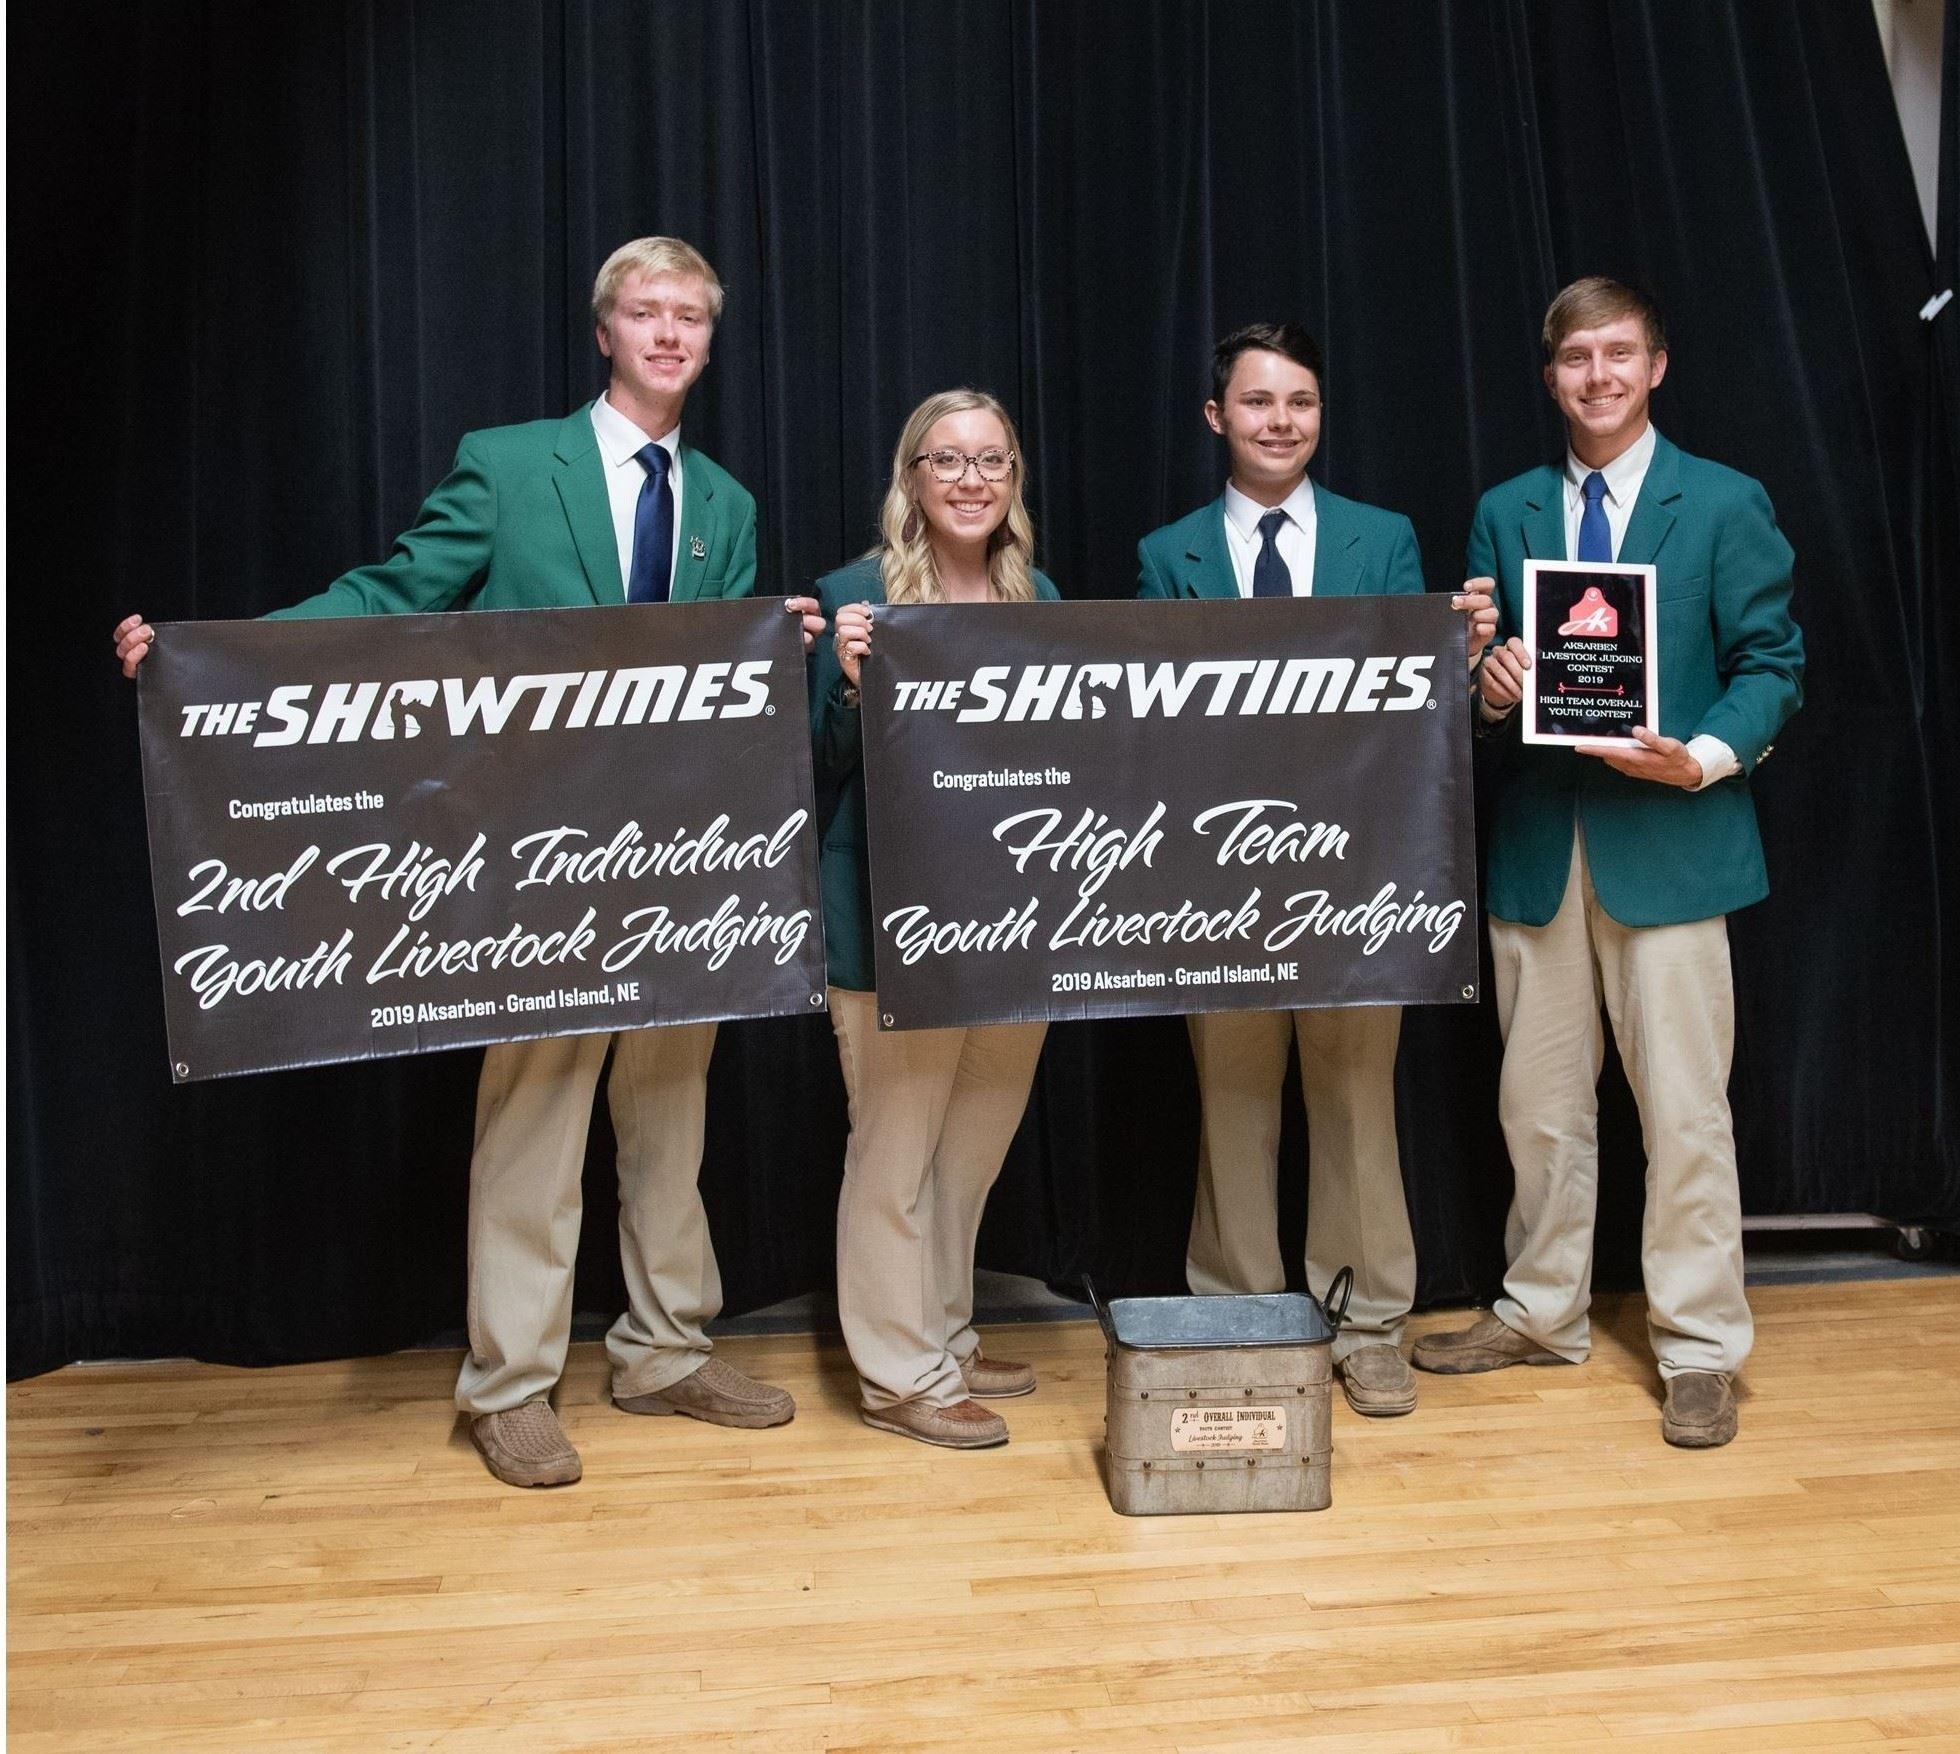 2019 High Team Youth Livestock Judging